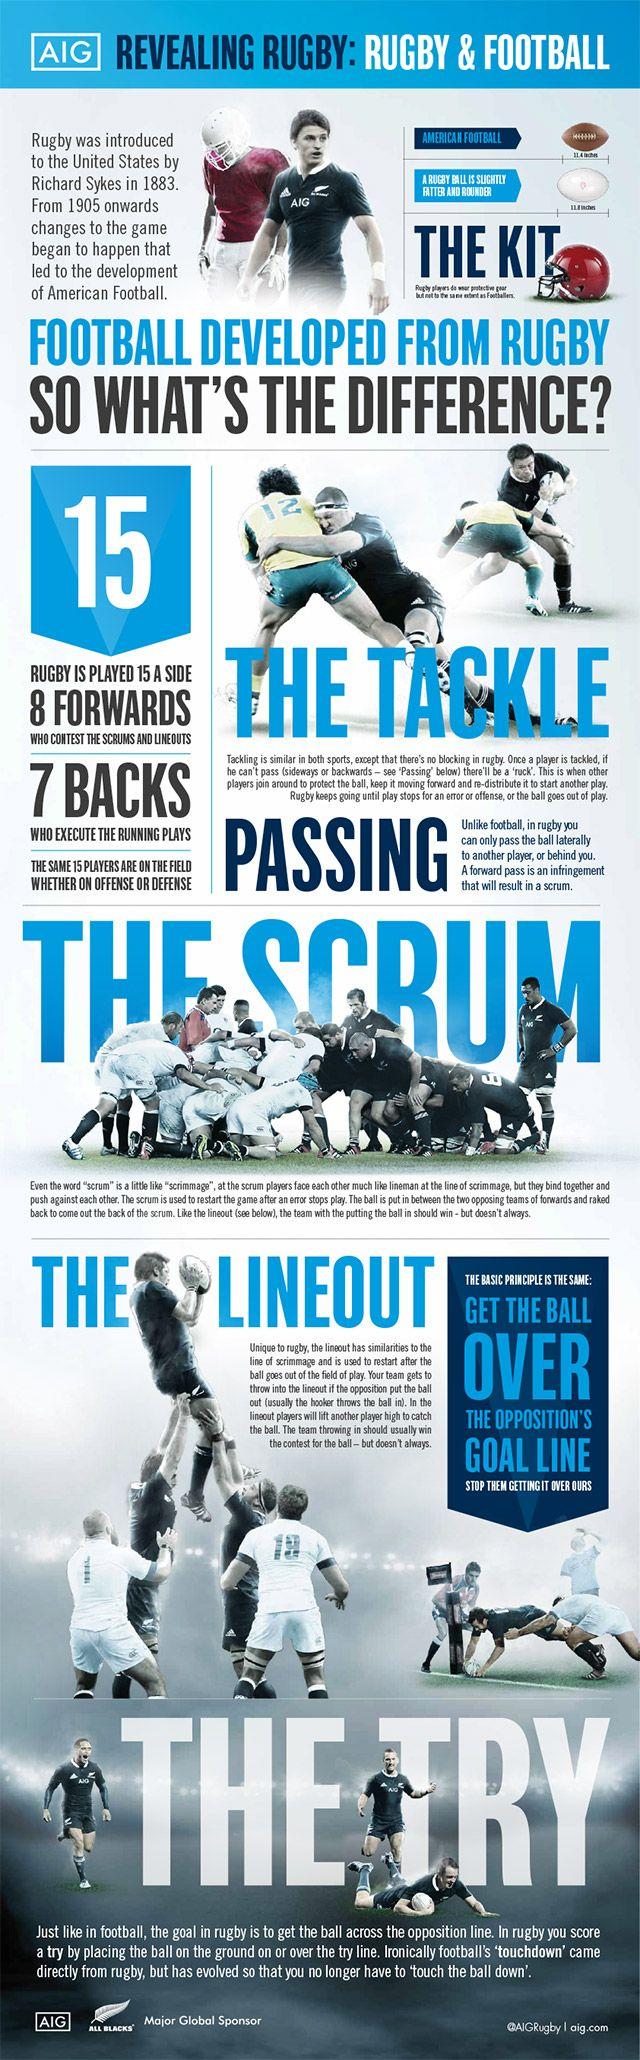 Rugby 101 » All Blacks - AIG